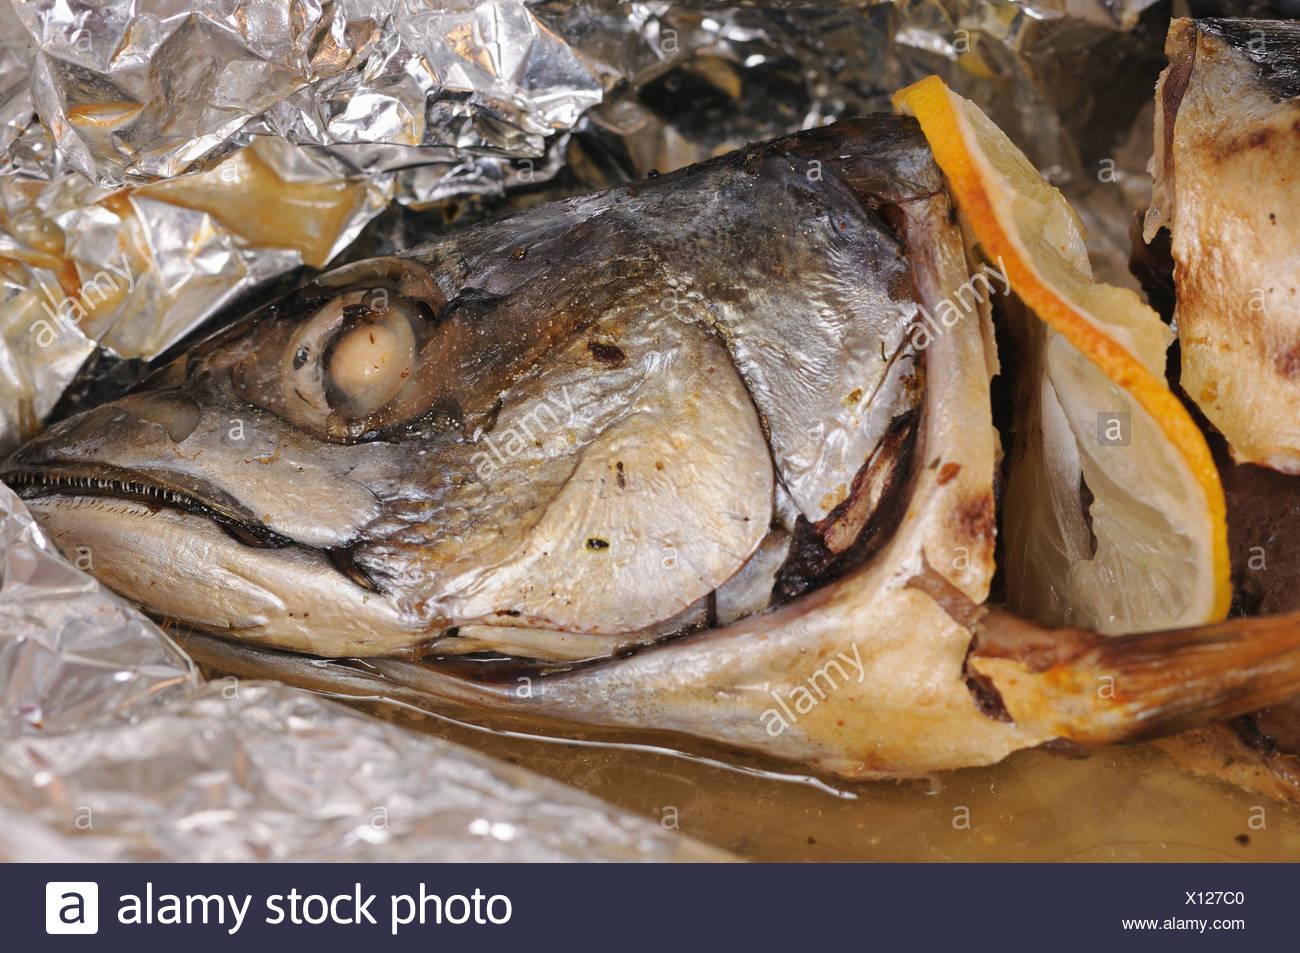 Mackerel - Stock Image